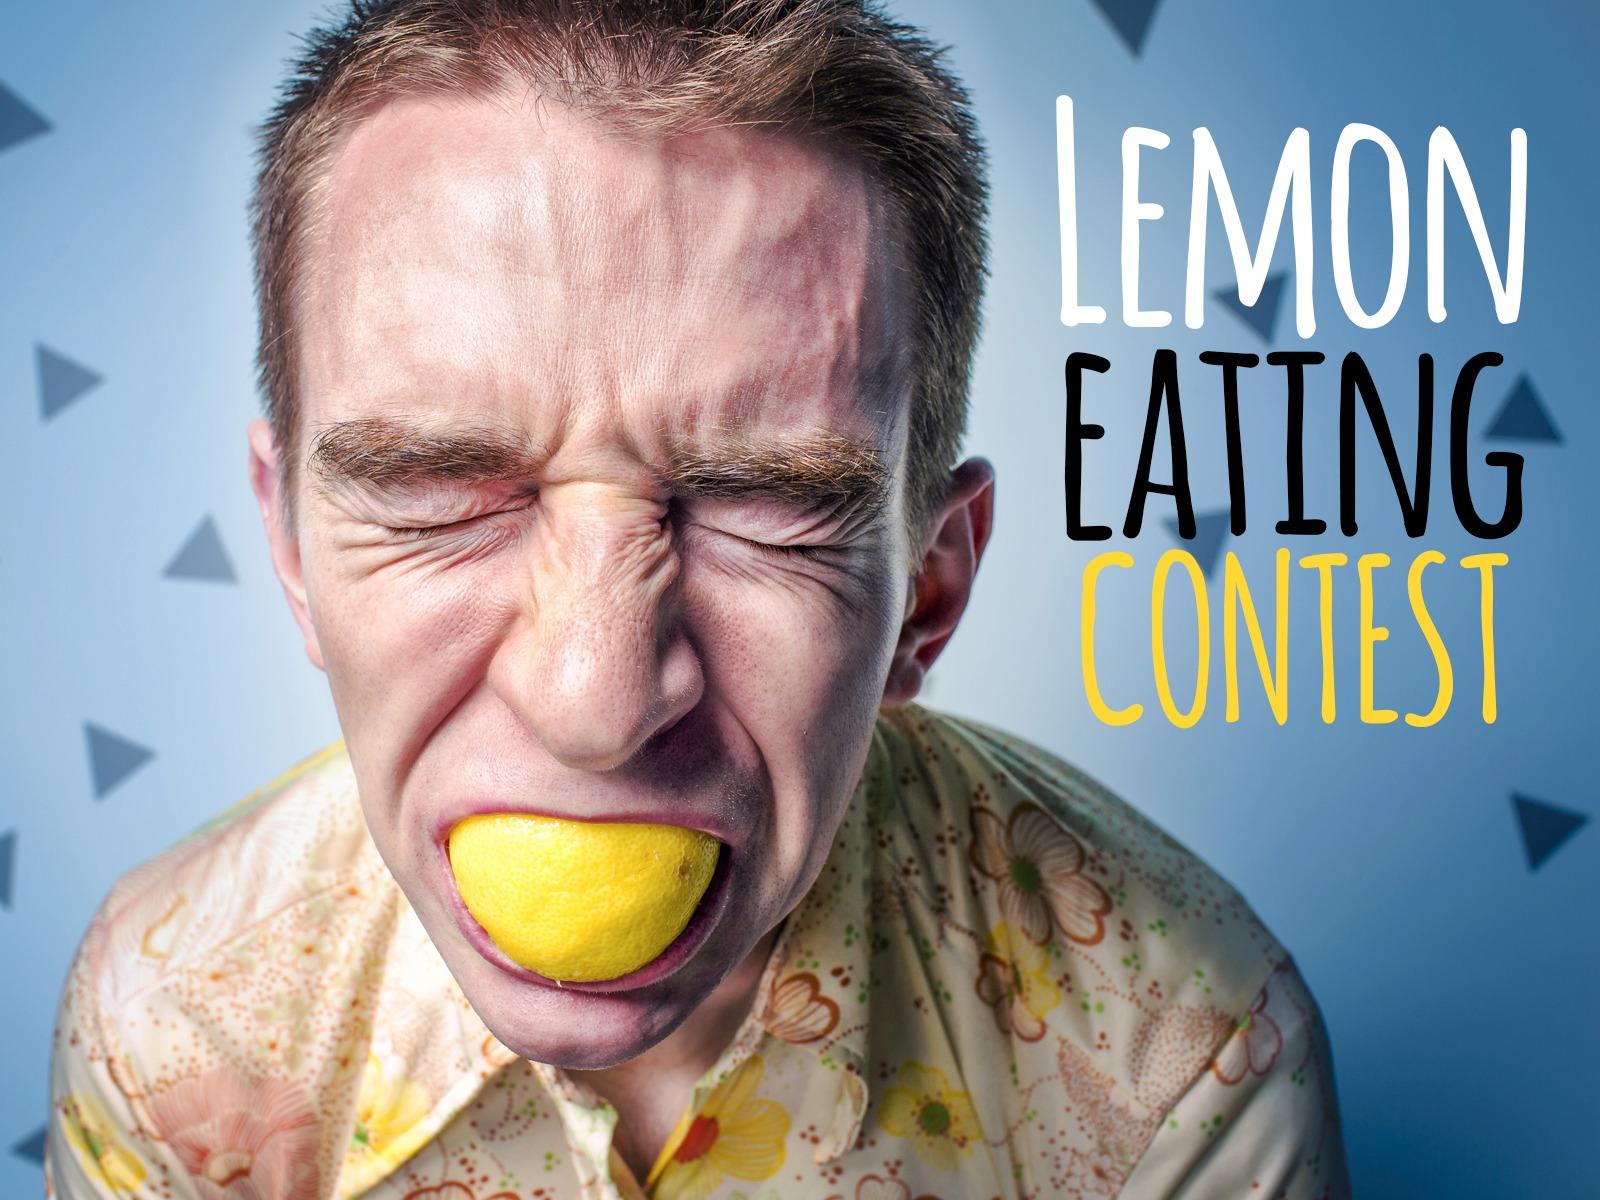 Lemon Eating Contest